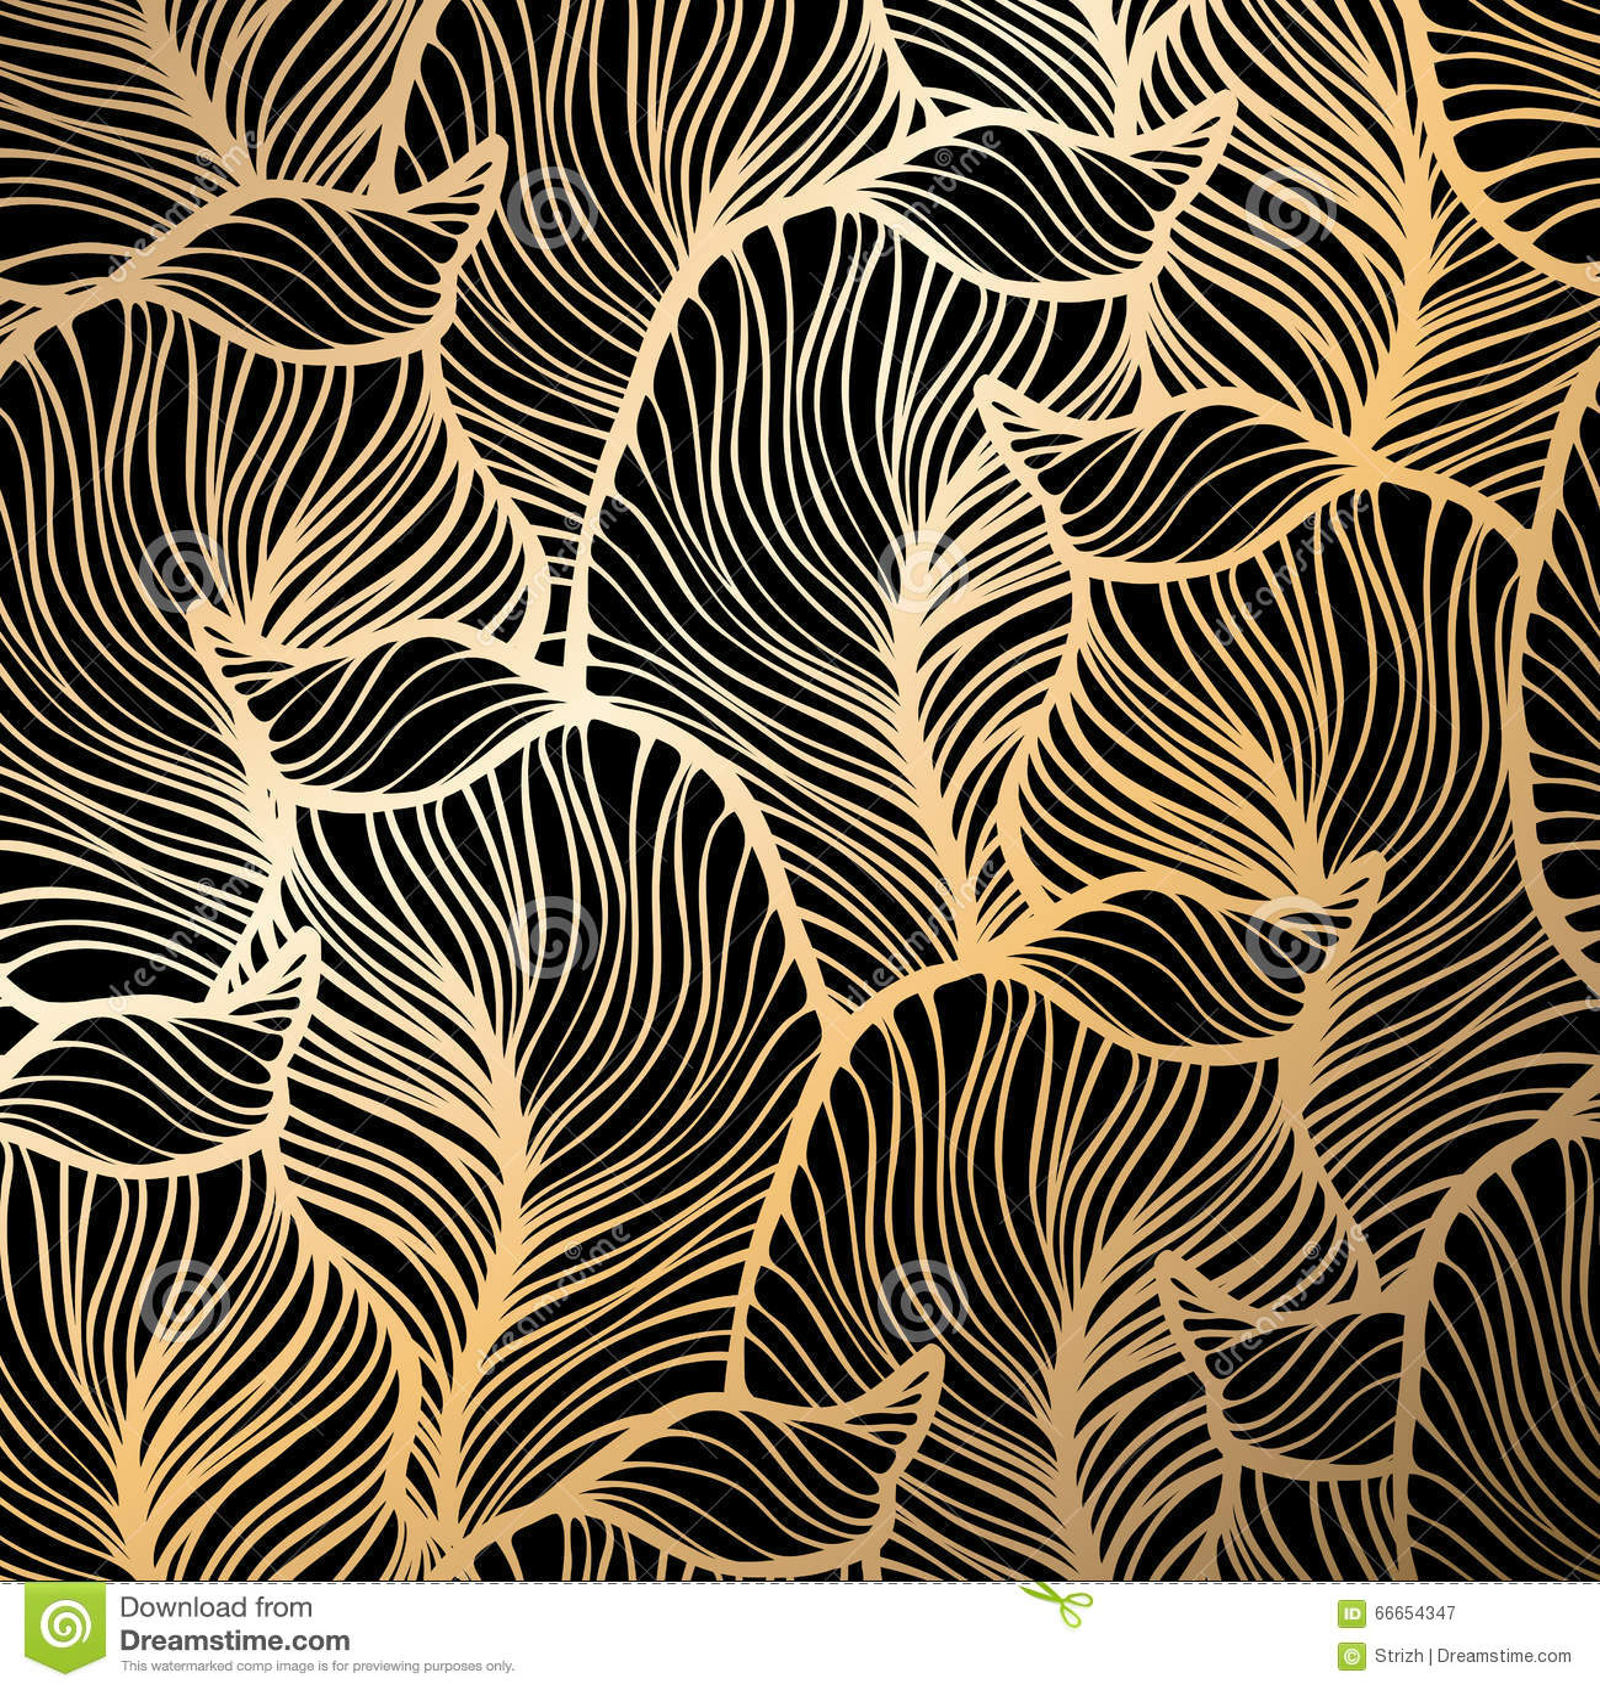 Damask Seamless Floral Pattern Royal Wallpaper Gold Ornate